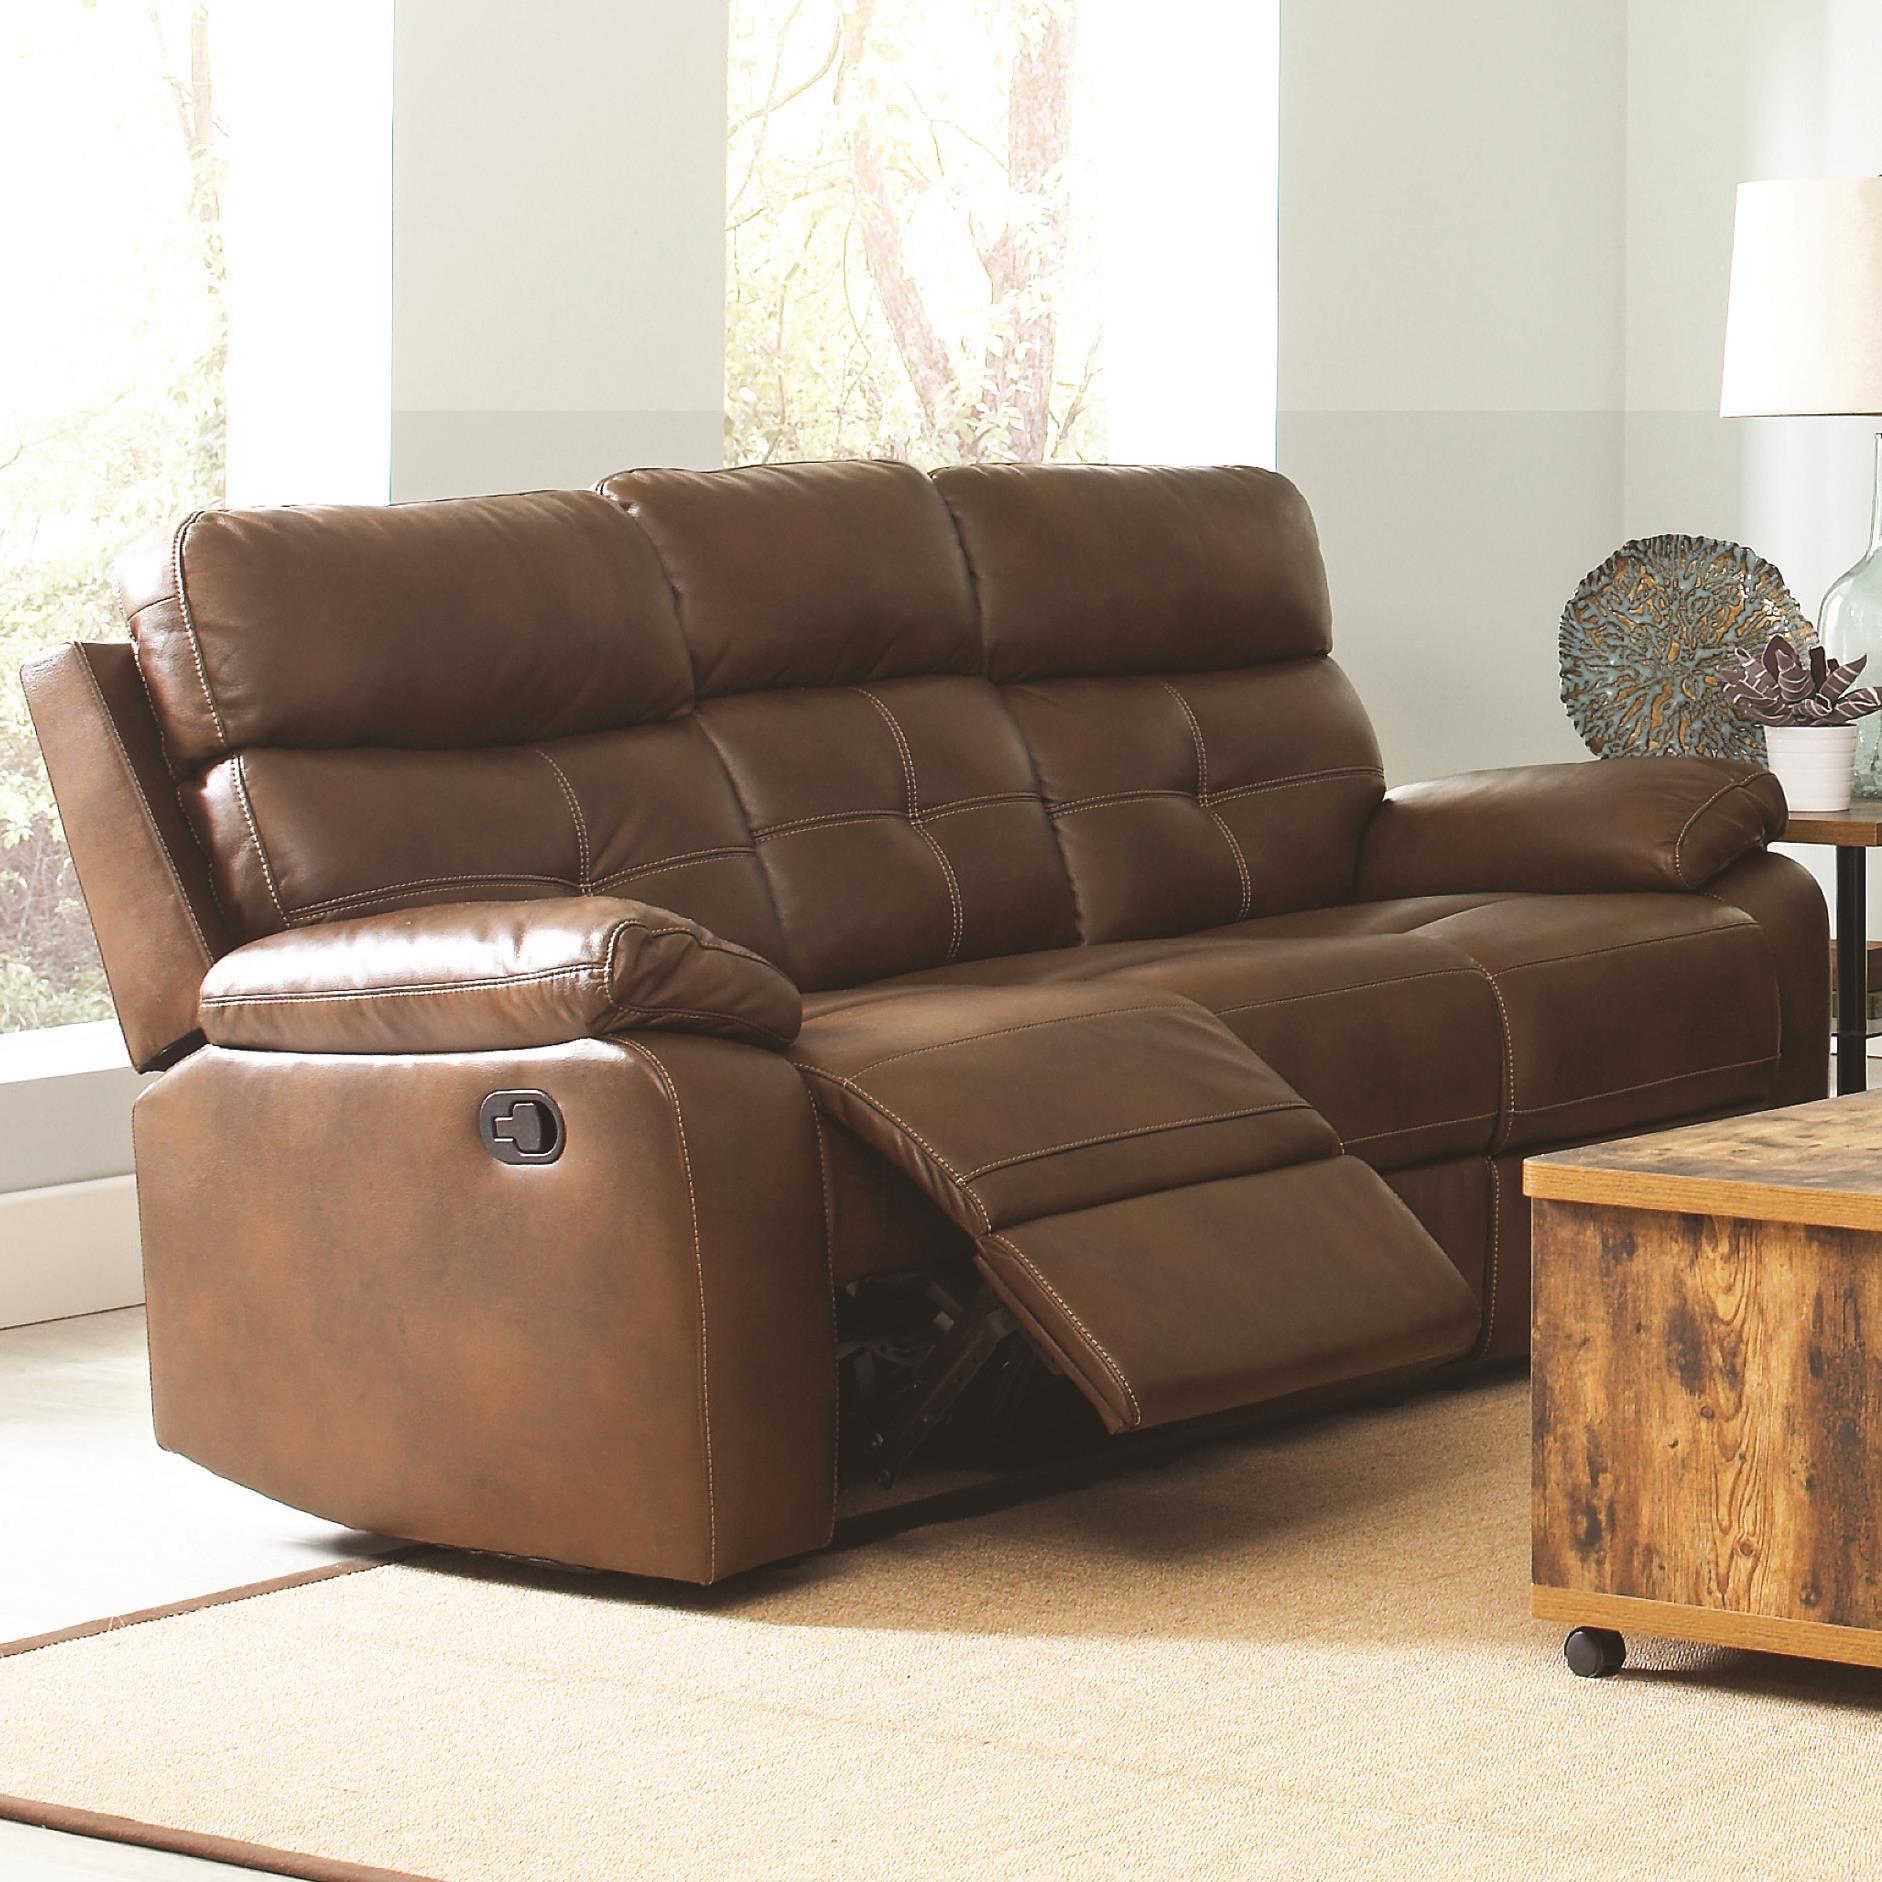 abbyson living bradford faux leather reclining sofa dark brown wicker corner uk recliner saddle dawson